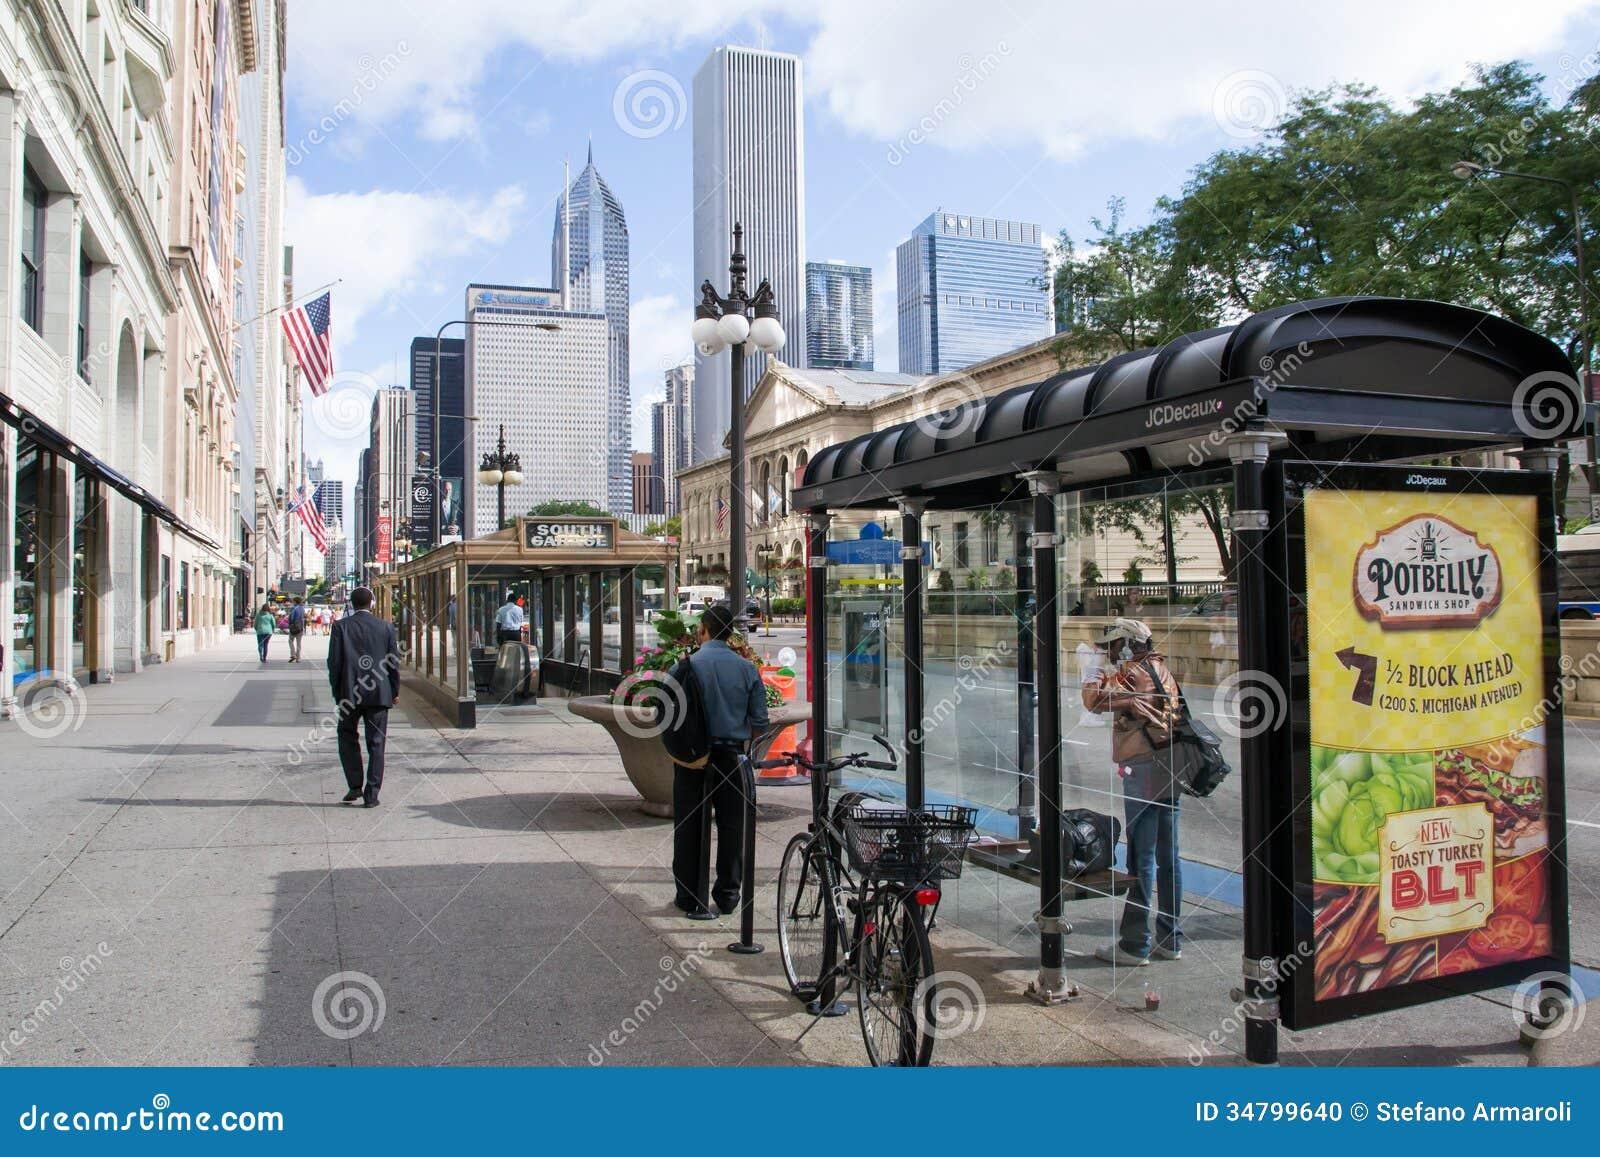 michigan avenue in chigago editorial image image 34799640. Black Bedroom Furniture Sets. Home Design Ideas